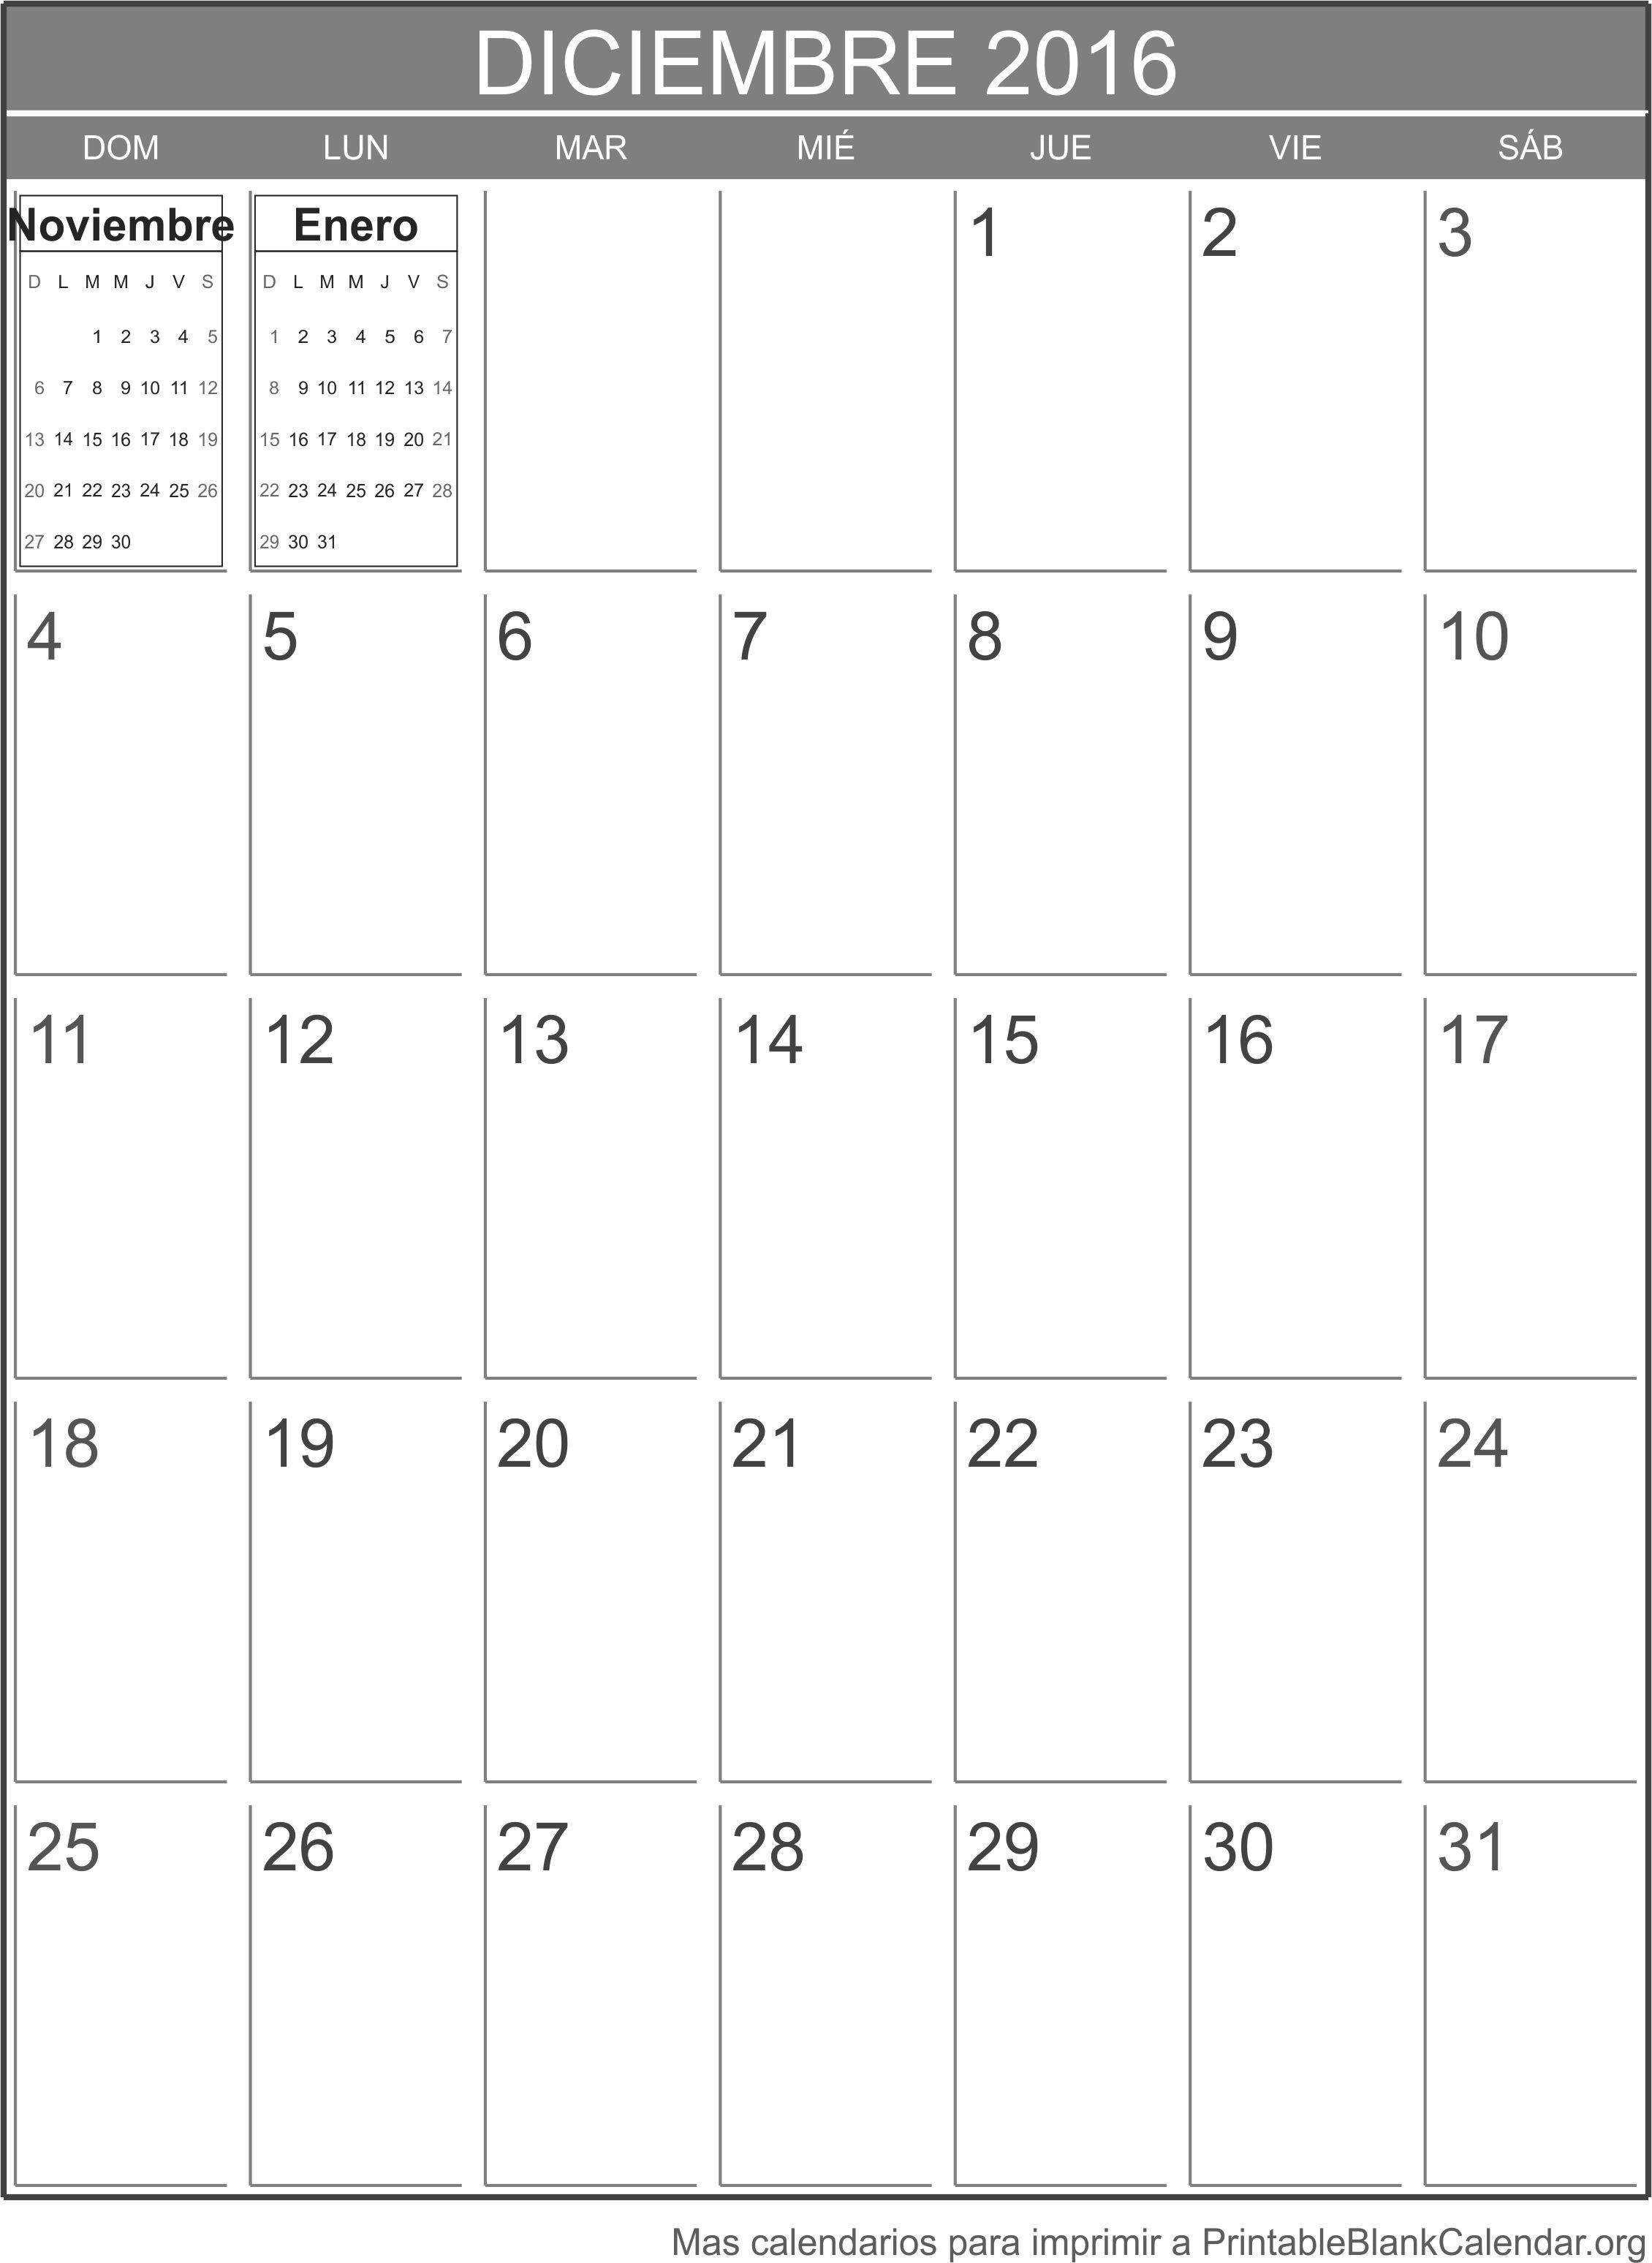 deciembre 2016 calendario